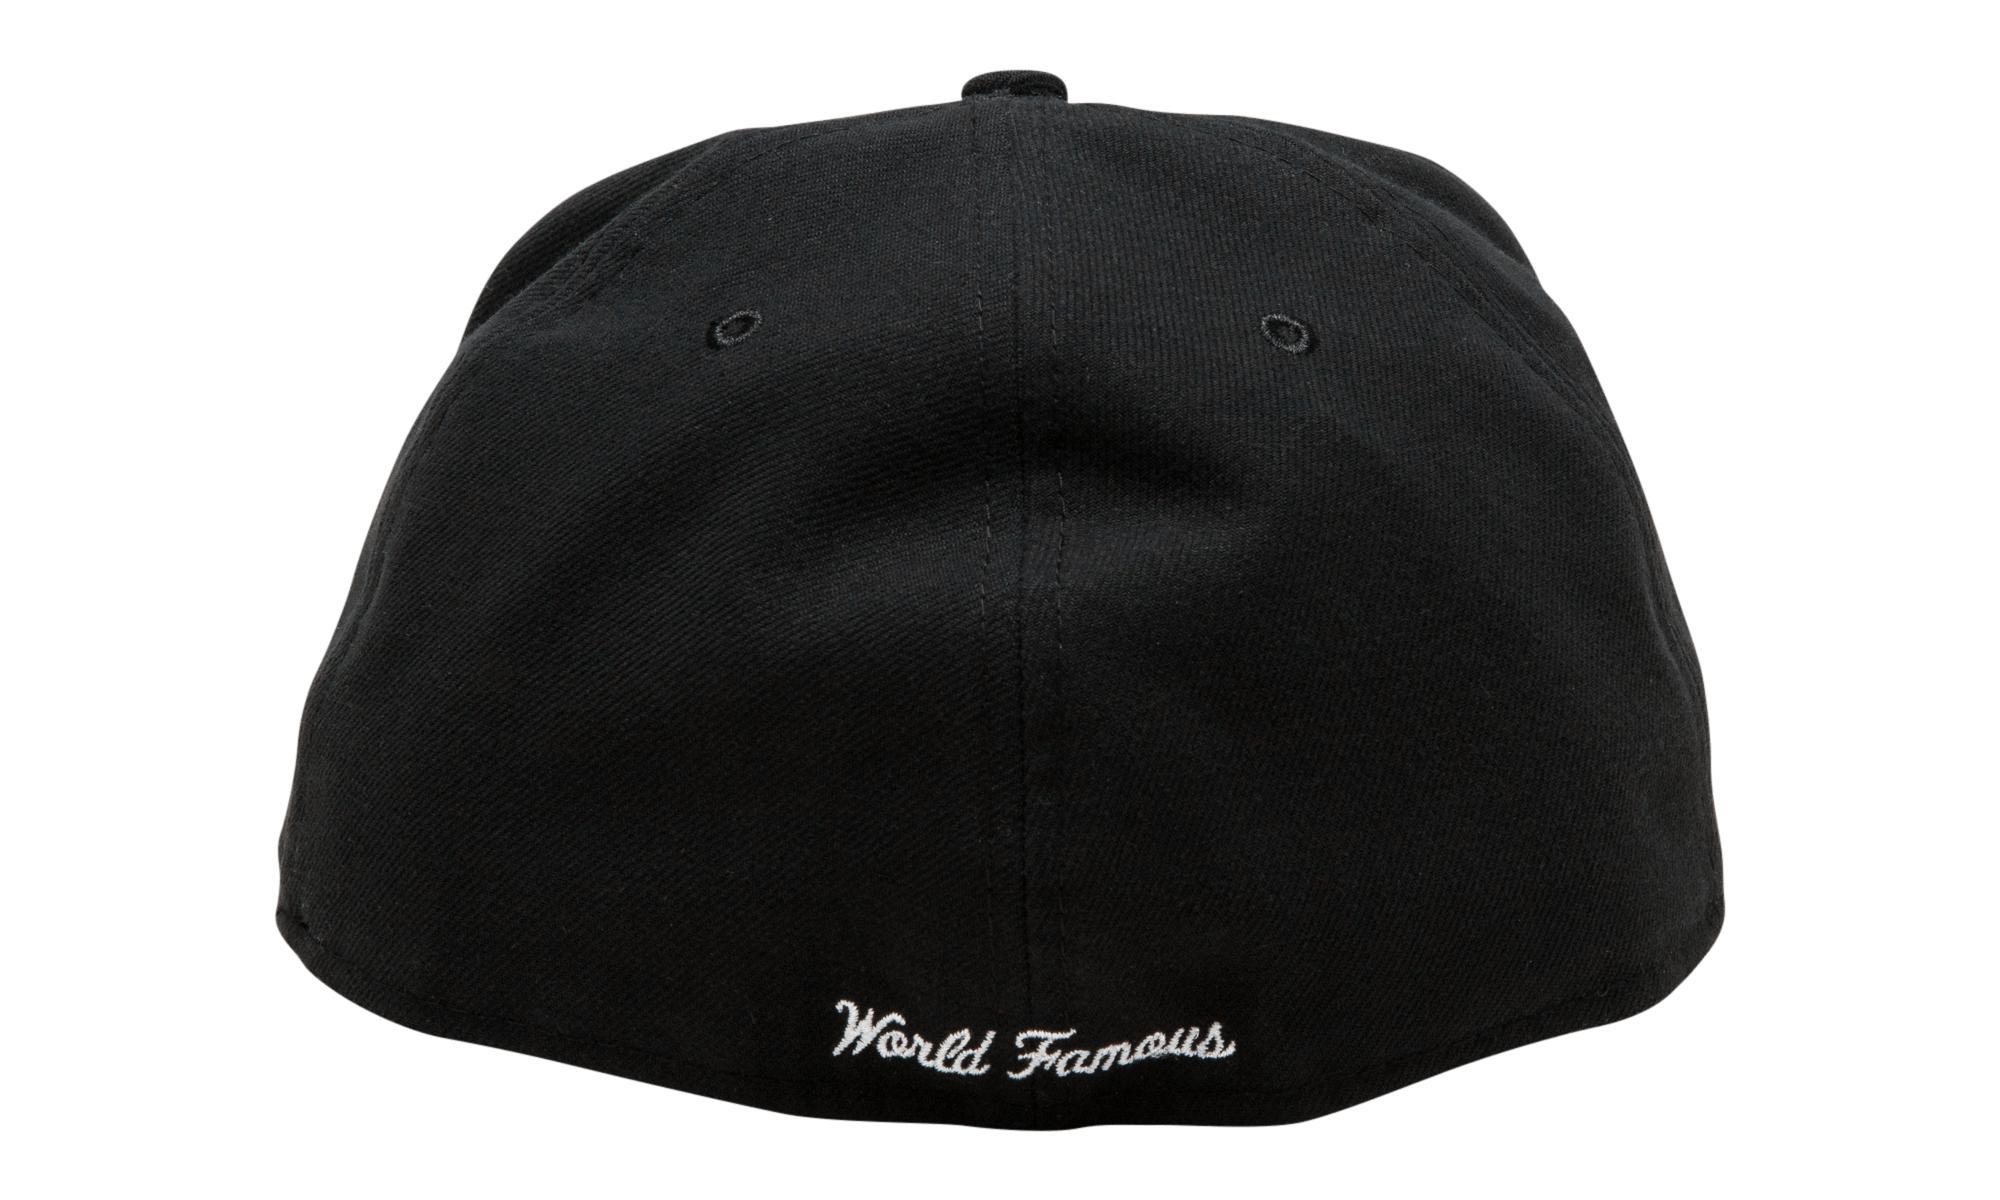 896251decd2 Supreme Gore-tex New Era Fitted Cap in Black for Men - Lyst